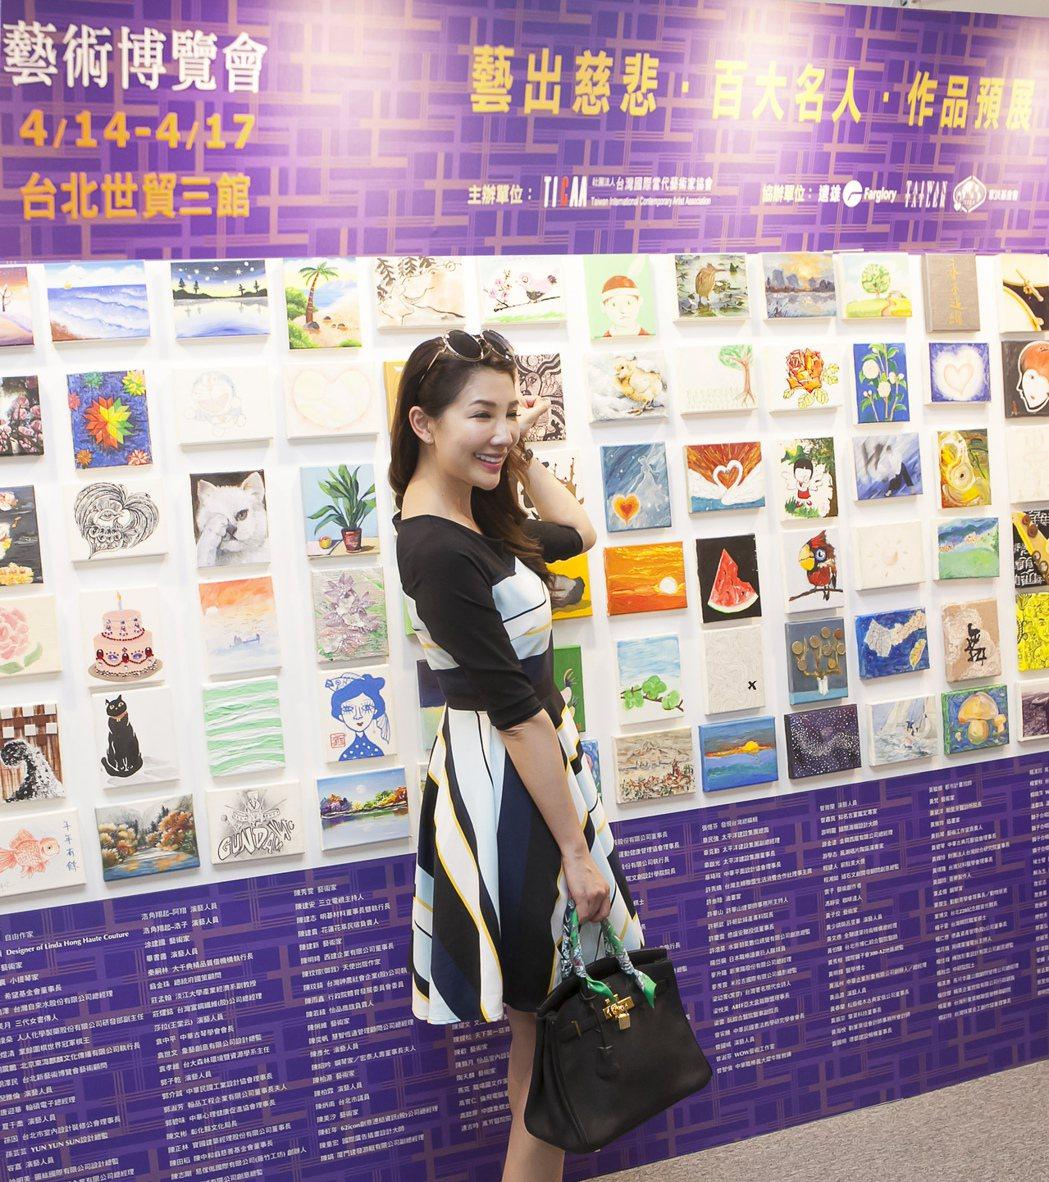 Pop Radio電台台長林書煒。百大名人畫作展示。台北新藝術博覽會(ART)/...